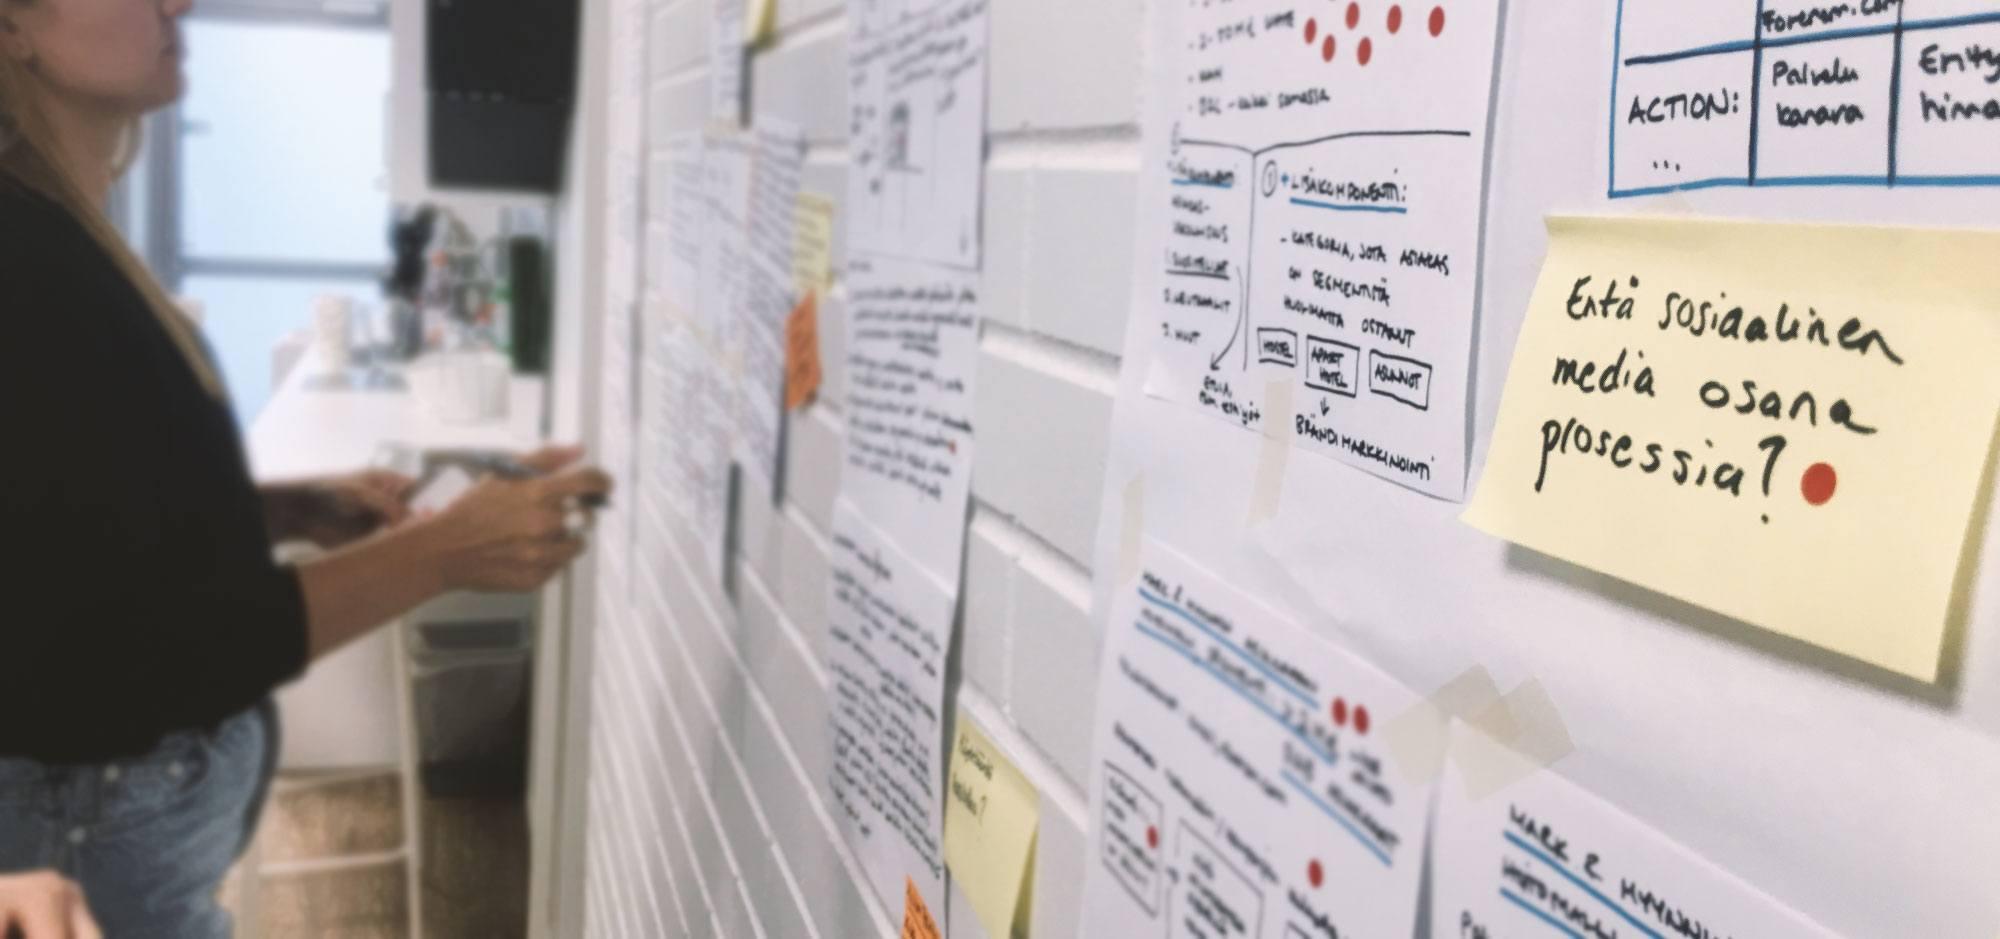 Design Sprint Forenom konseptien arviointi